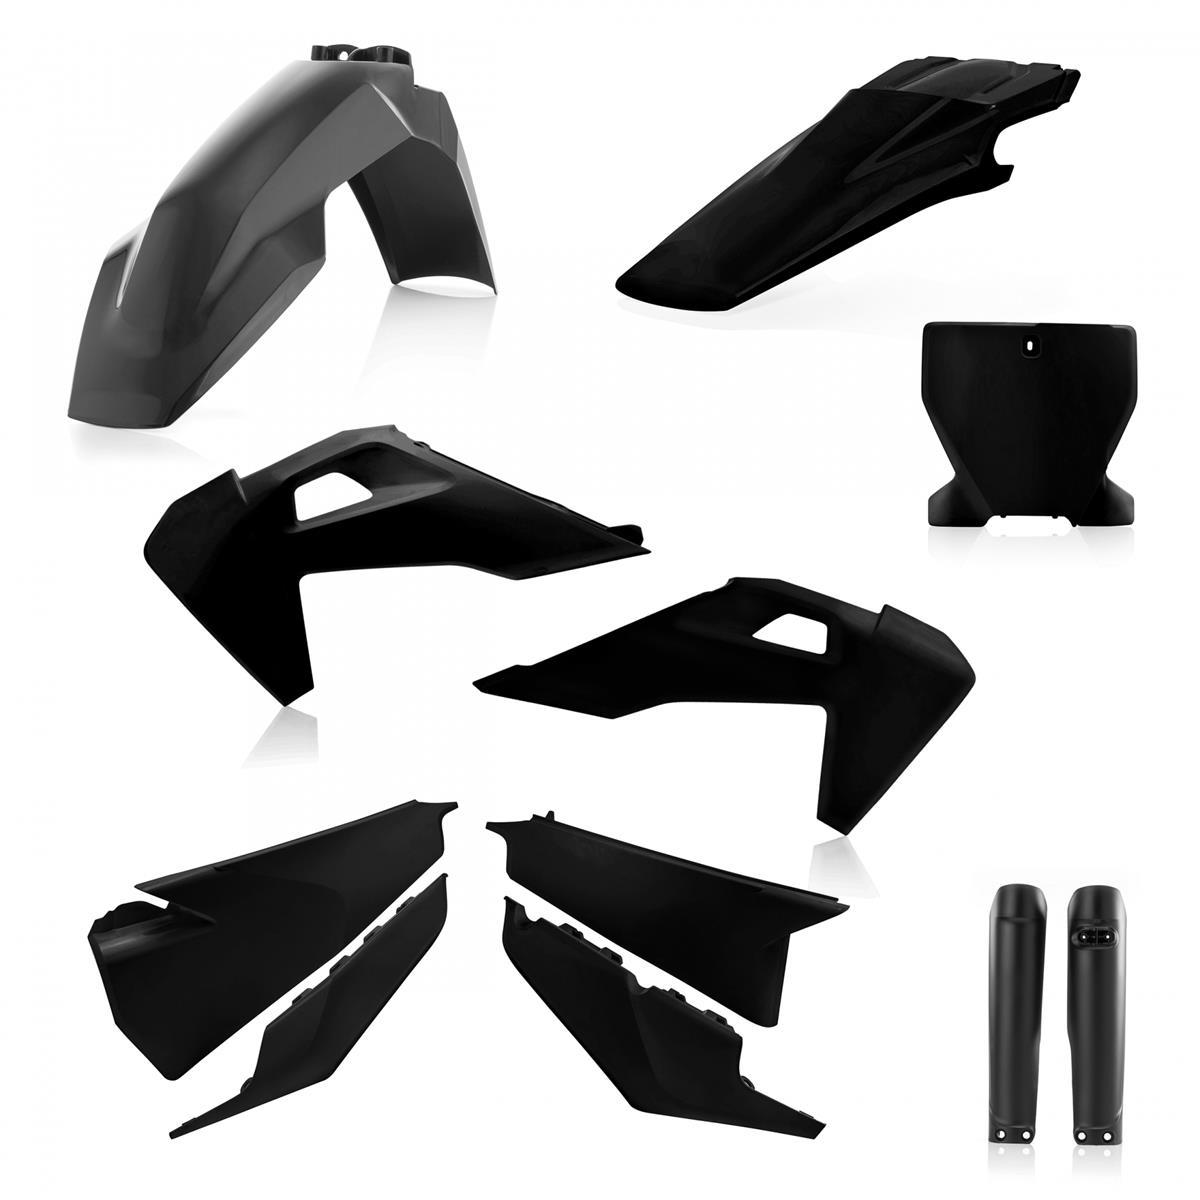 acerbis-plastik-kit-inkl-bremsscheibenschutz-plastic-kit-incl-brake-disk-protection-full-kit-1 (1)